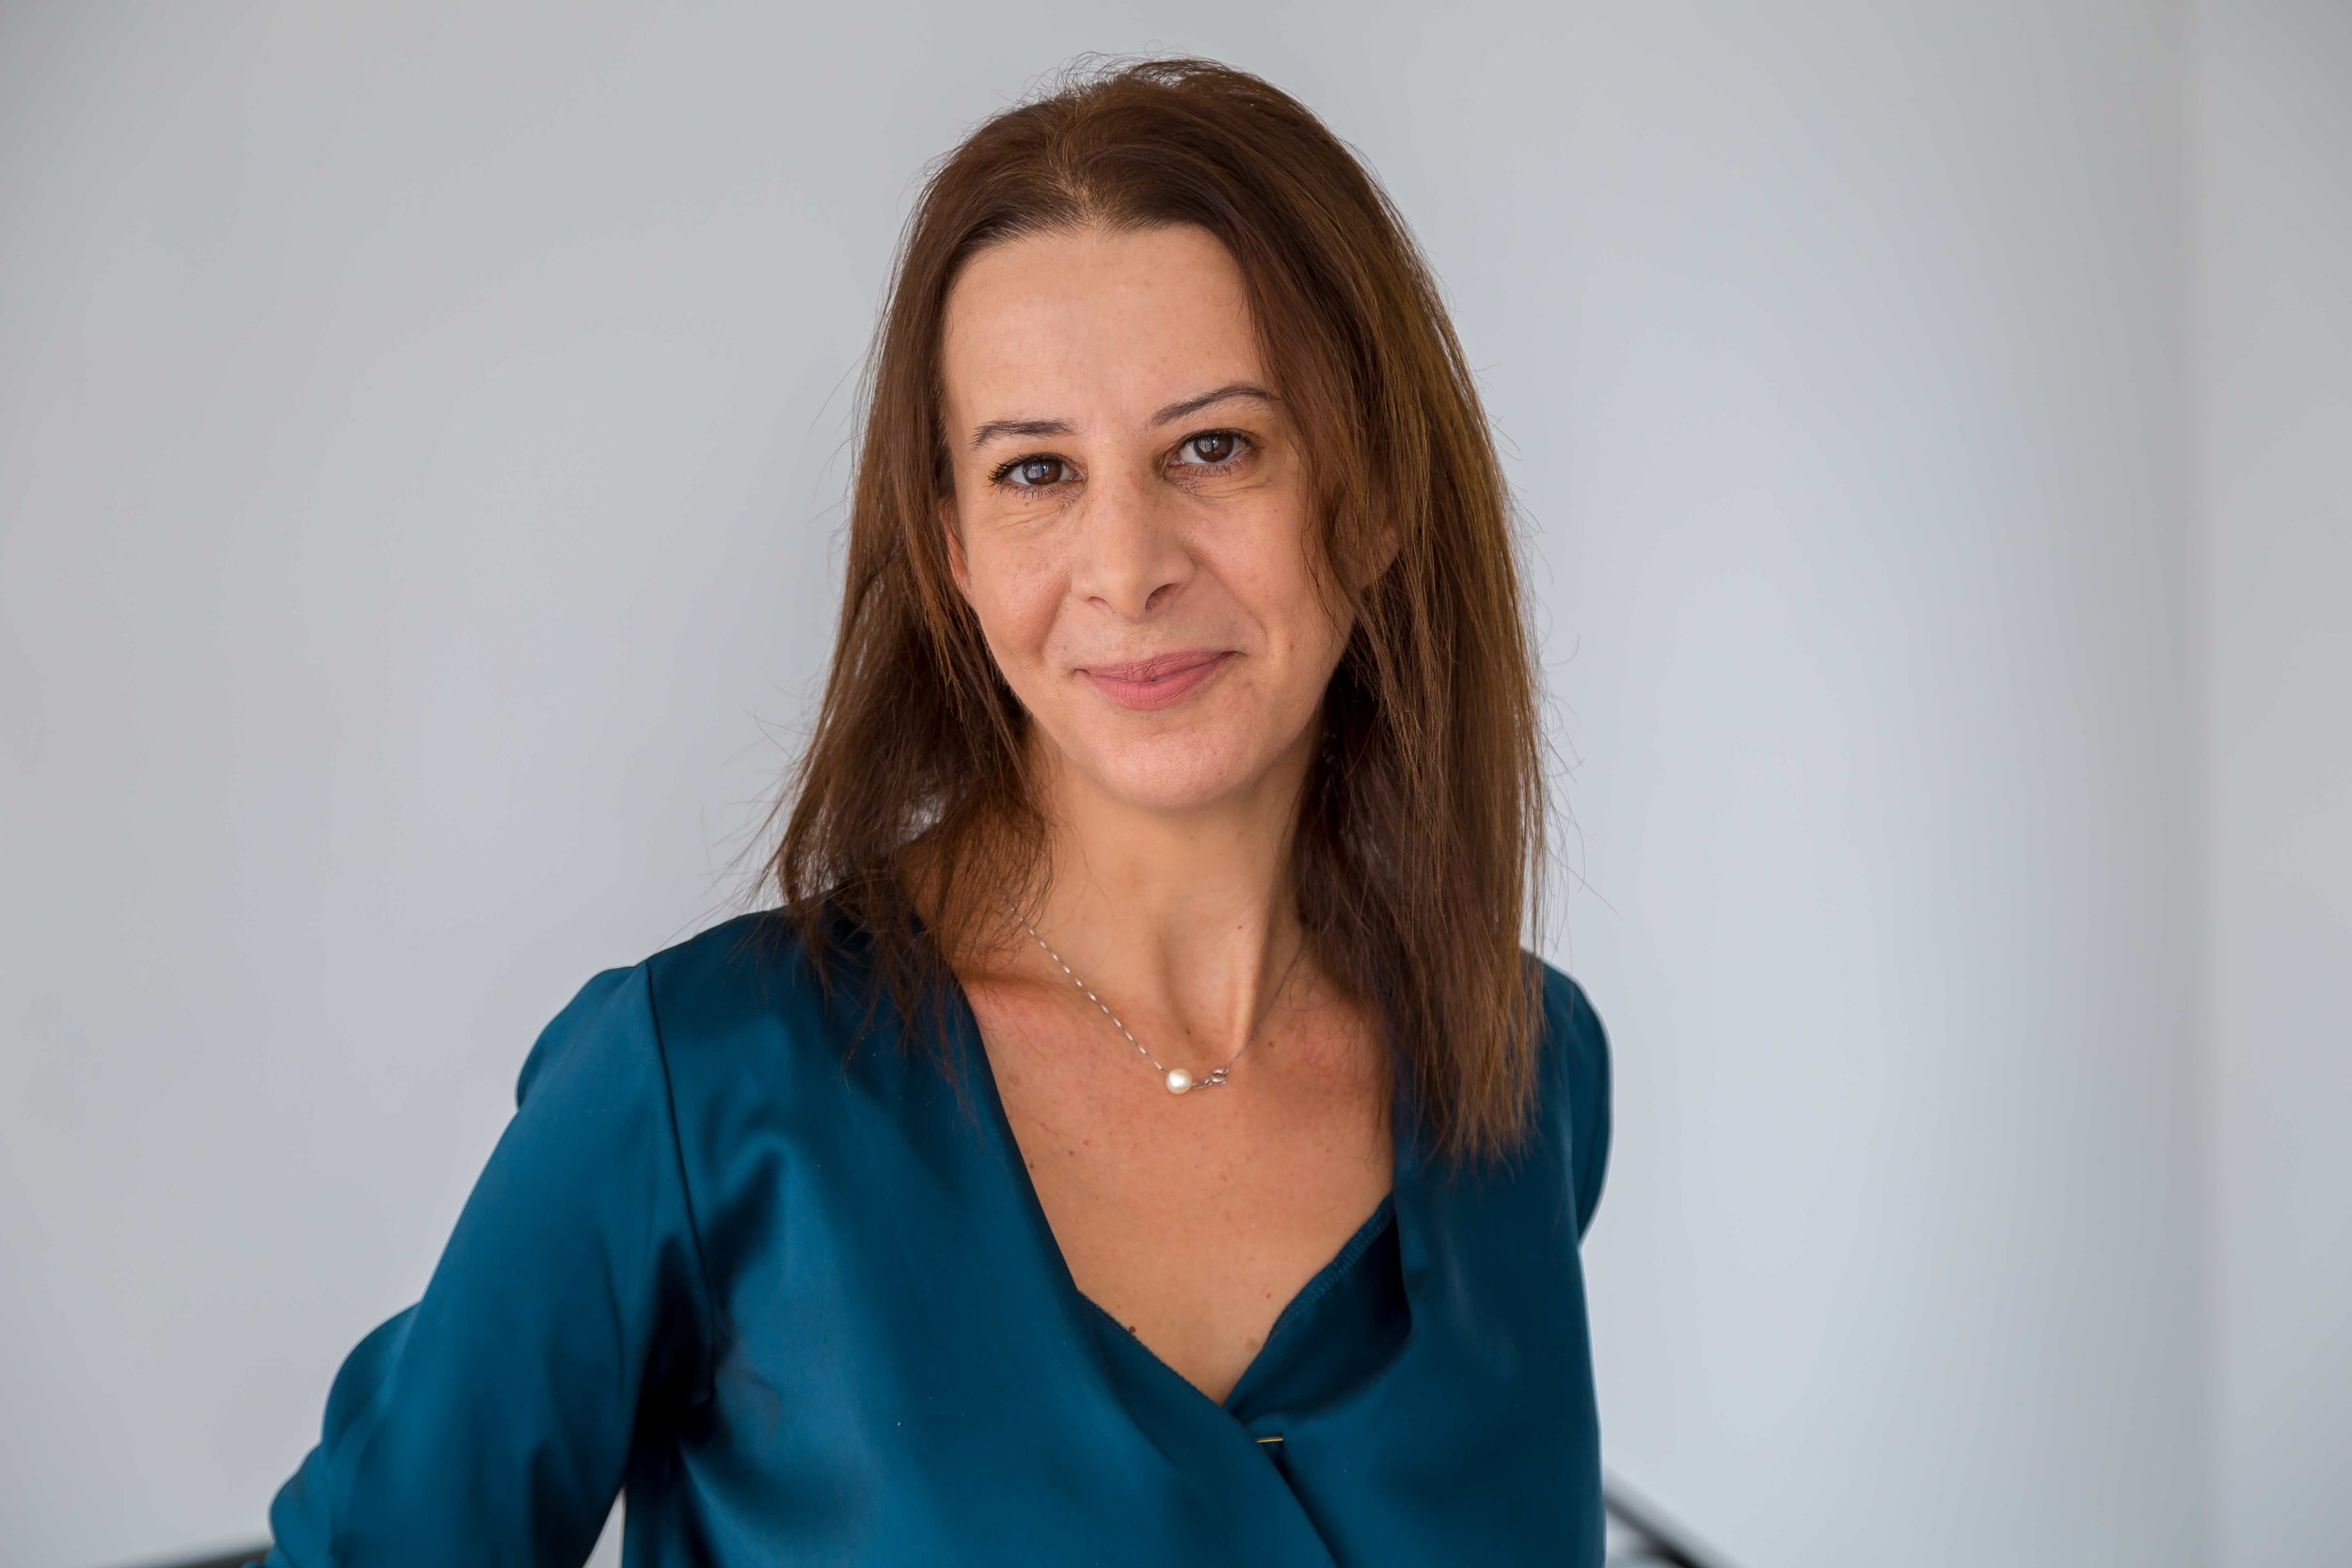 Marina Zanetti